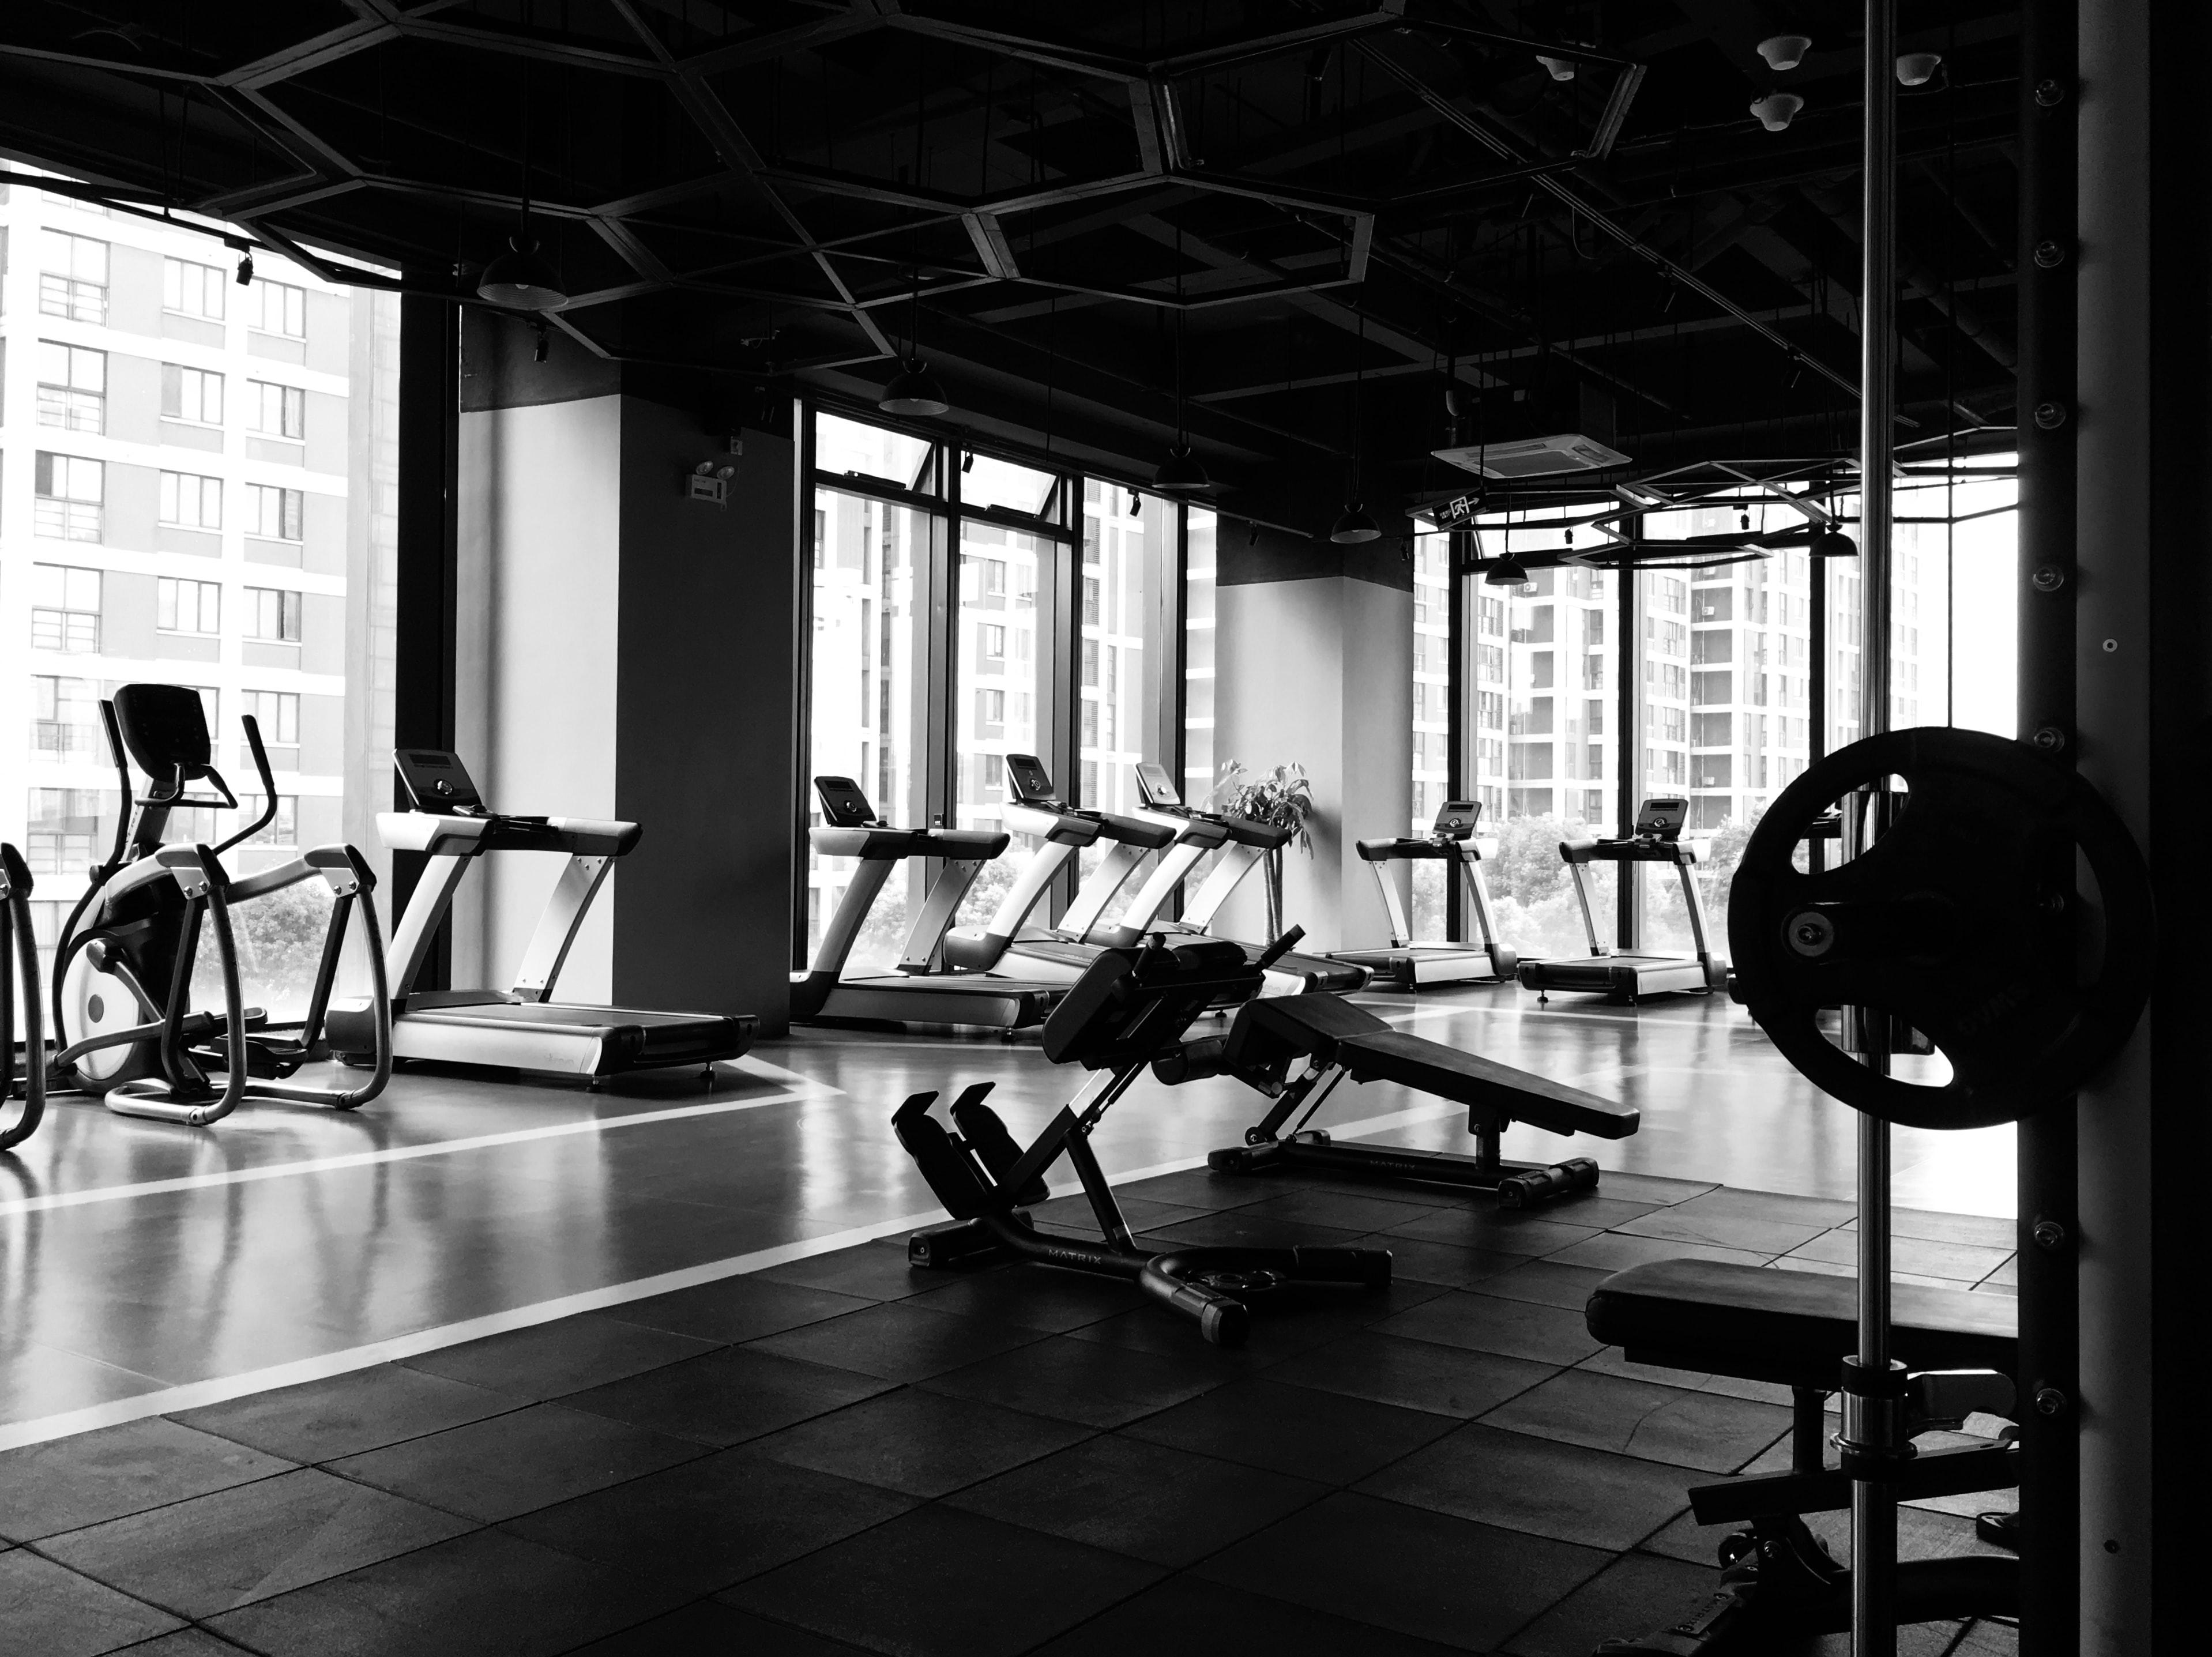 gimanasio y estudio fitness